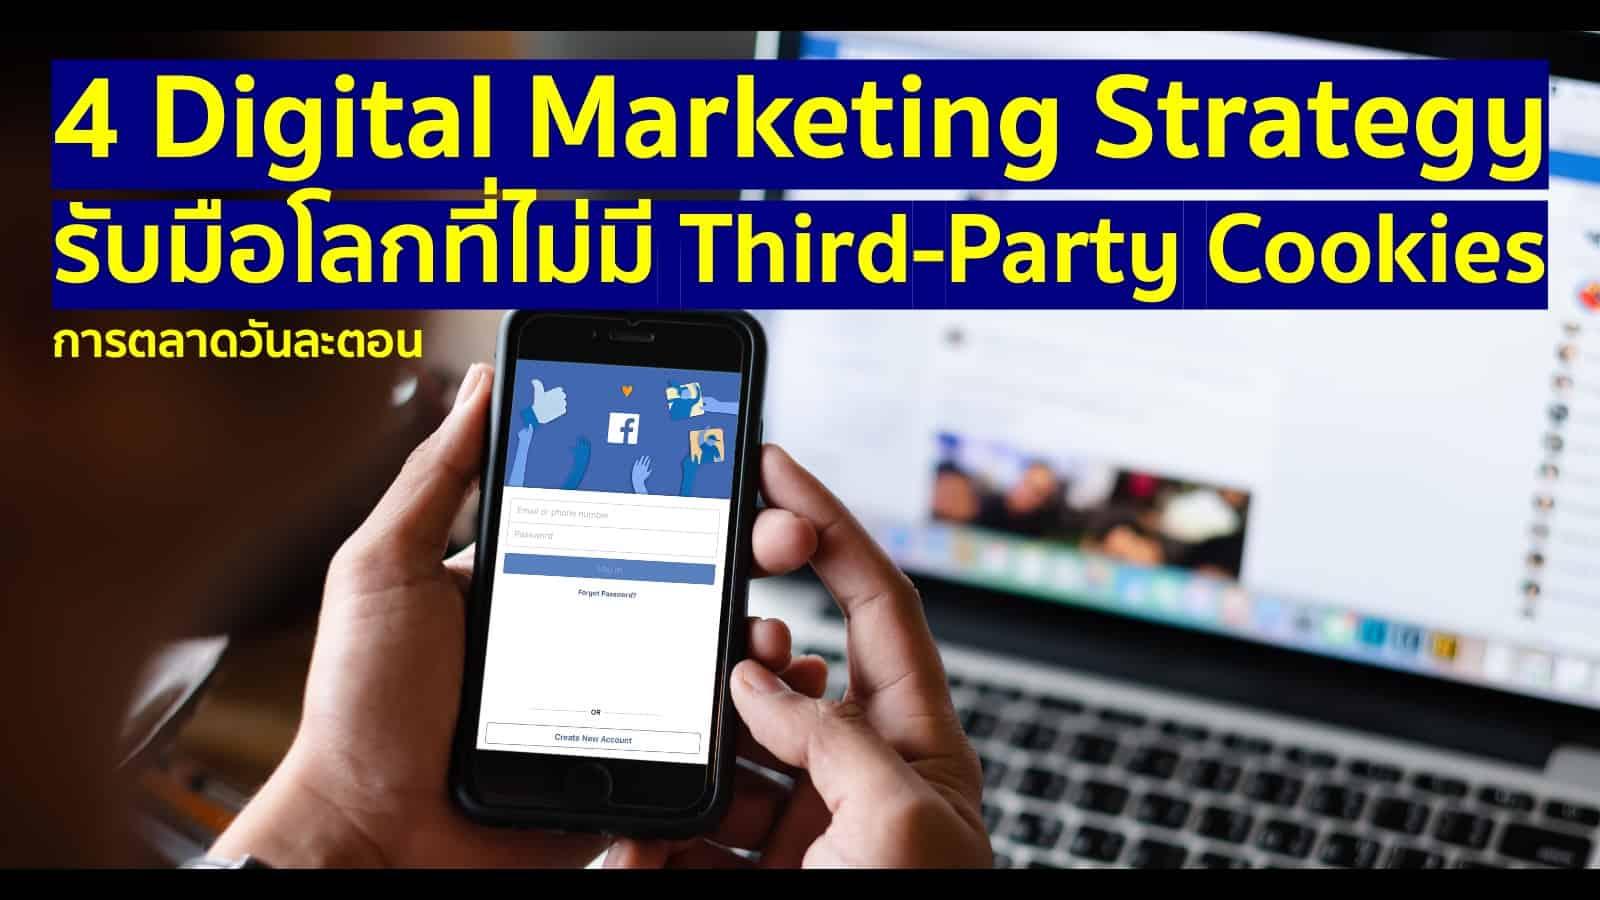 4 Digital Marketing Strategy 2022 เพื่อรับมือโลกที่ไม่มี Third-Party Cookies